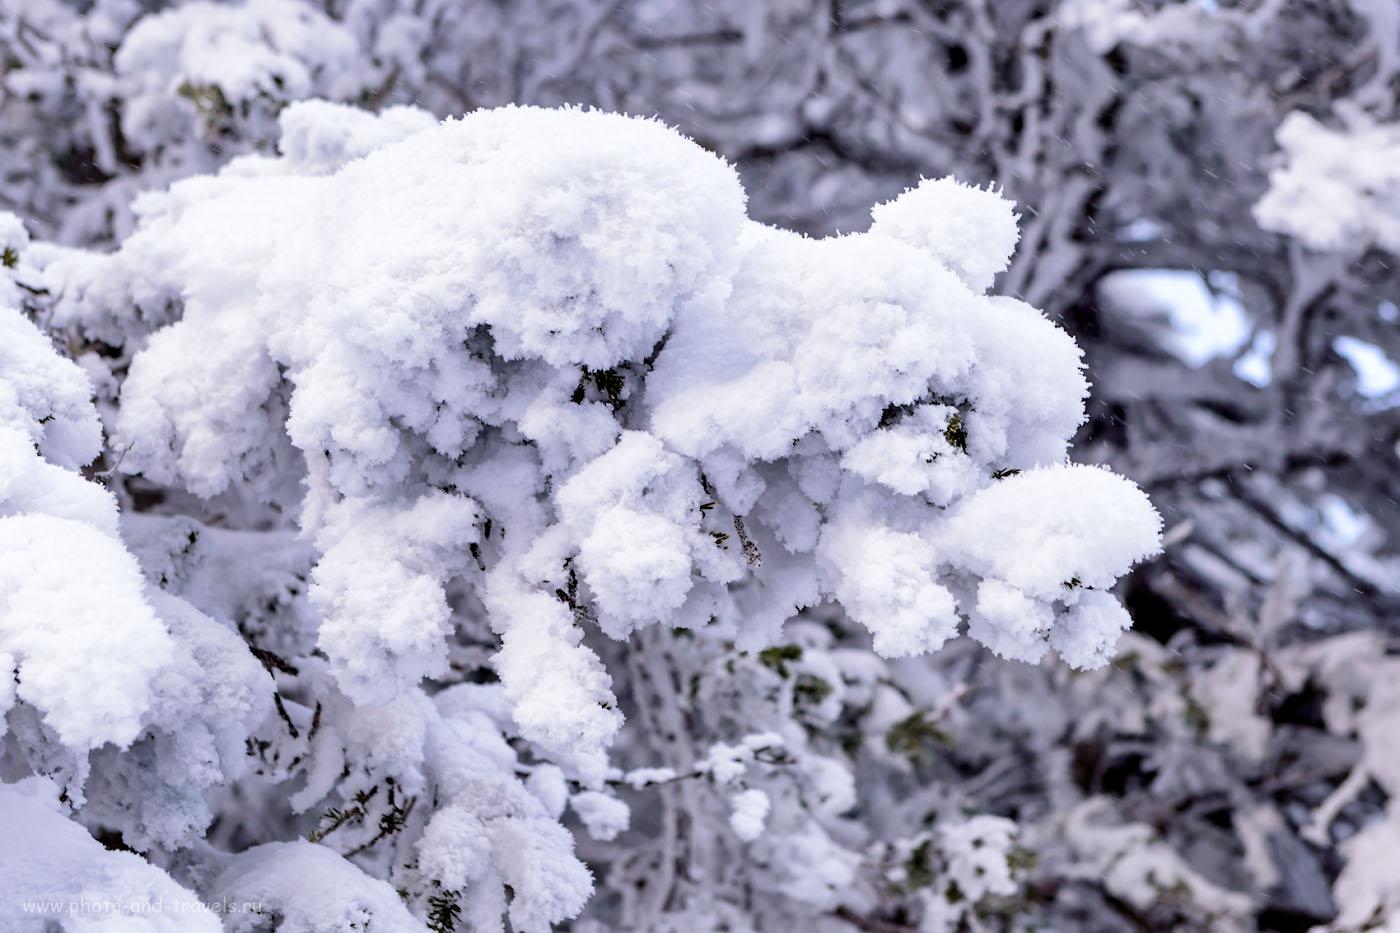 Фото 24. Тепло ли тебе, деревце? 1/160, +1.0, 6.3, 450, 70.